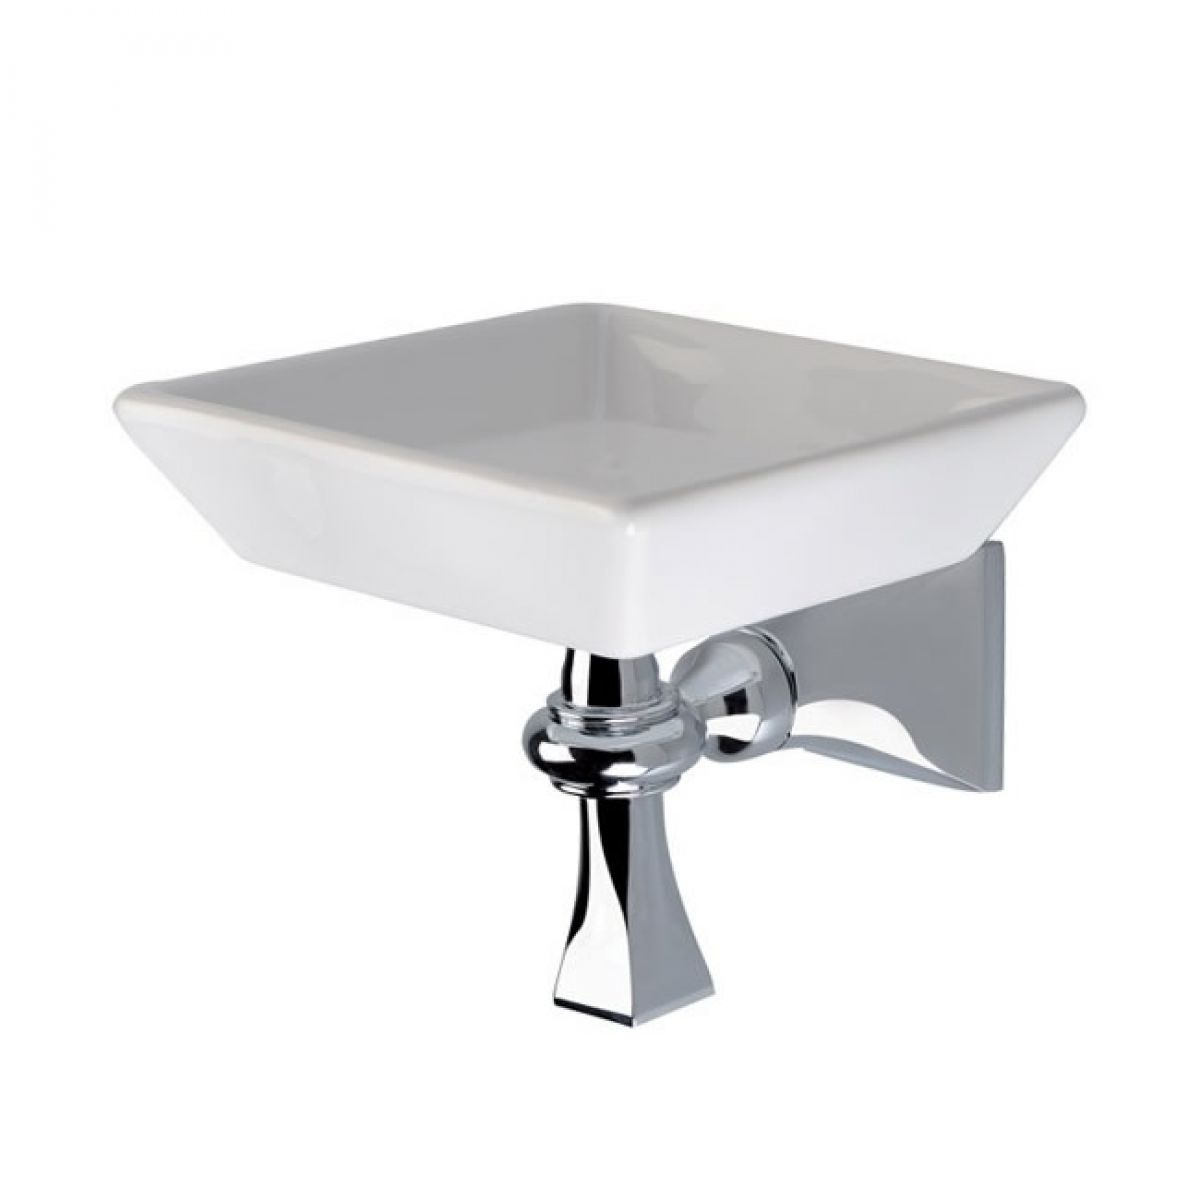 Imperial Highgate Wall Mounted Ceramic Soap Dish Uk Bathrooms